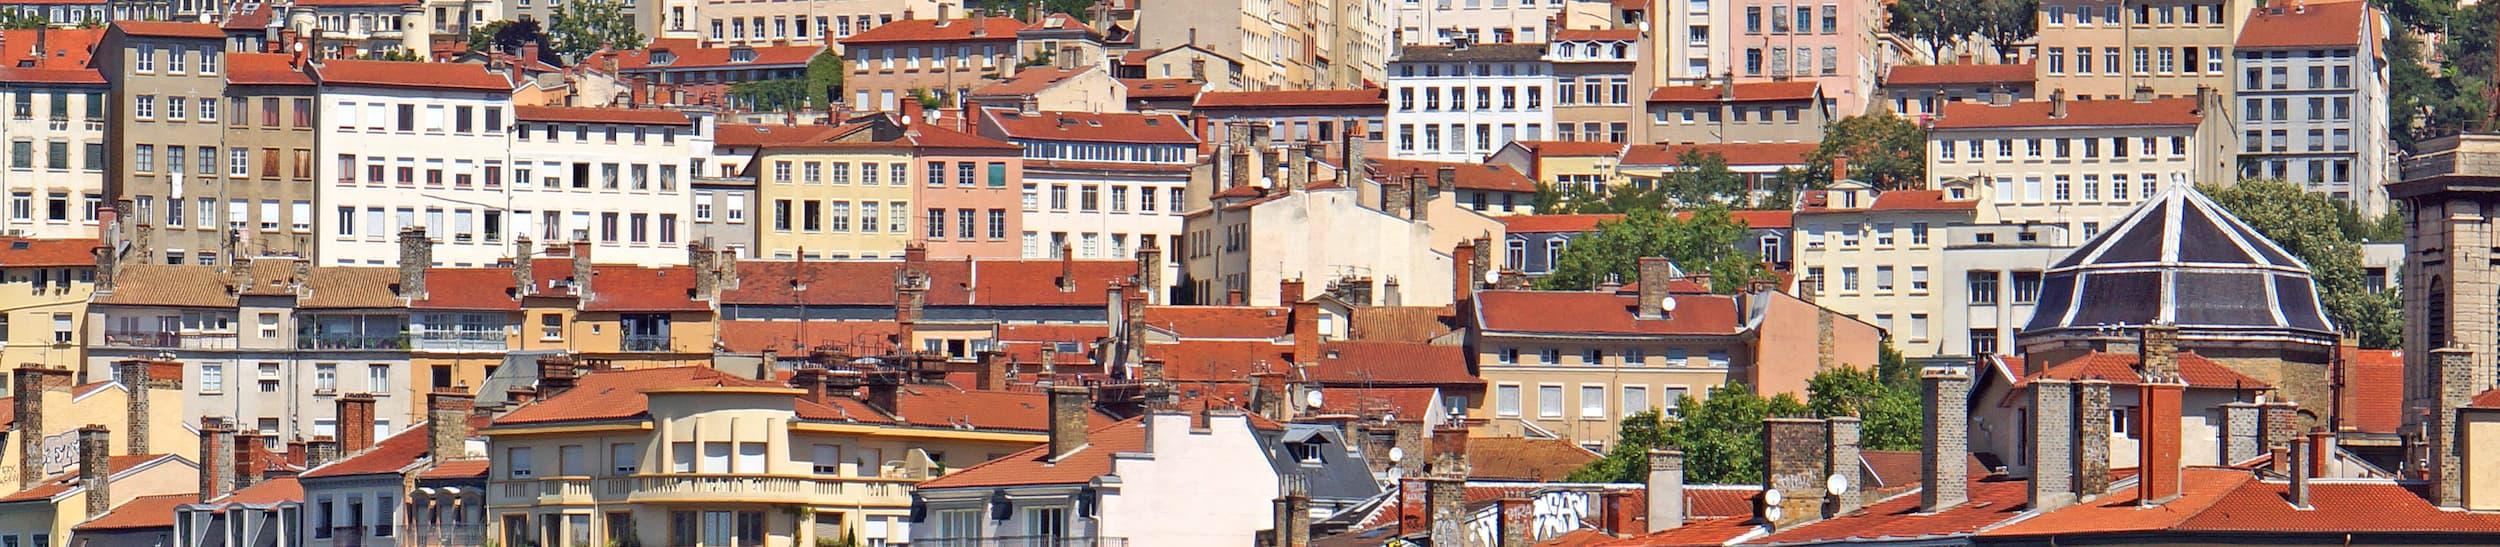 Skyline of Lyon